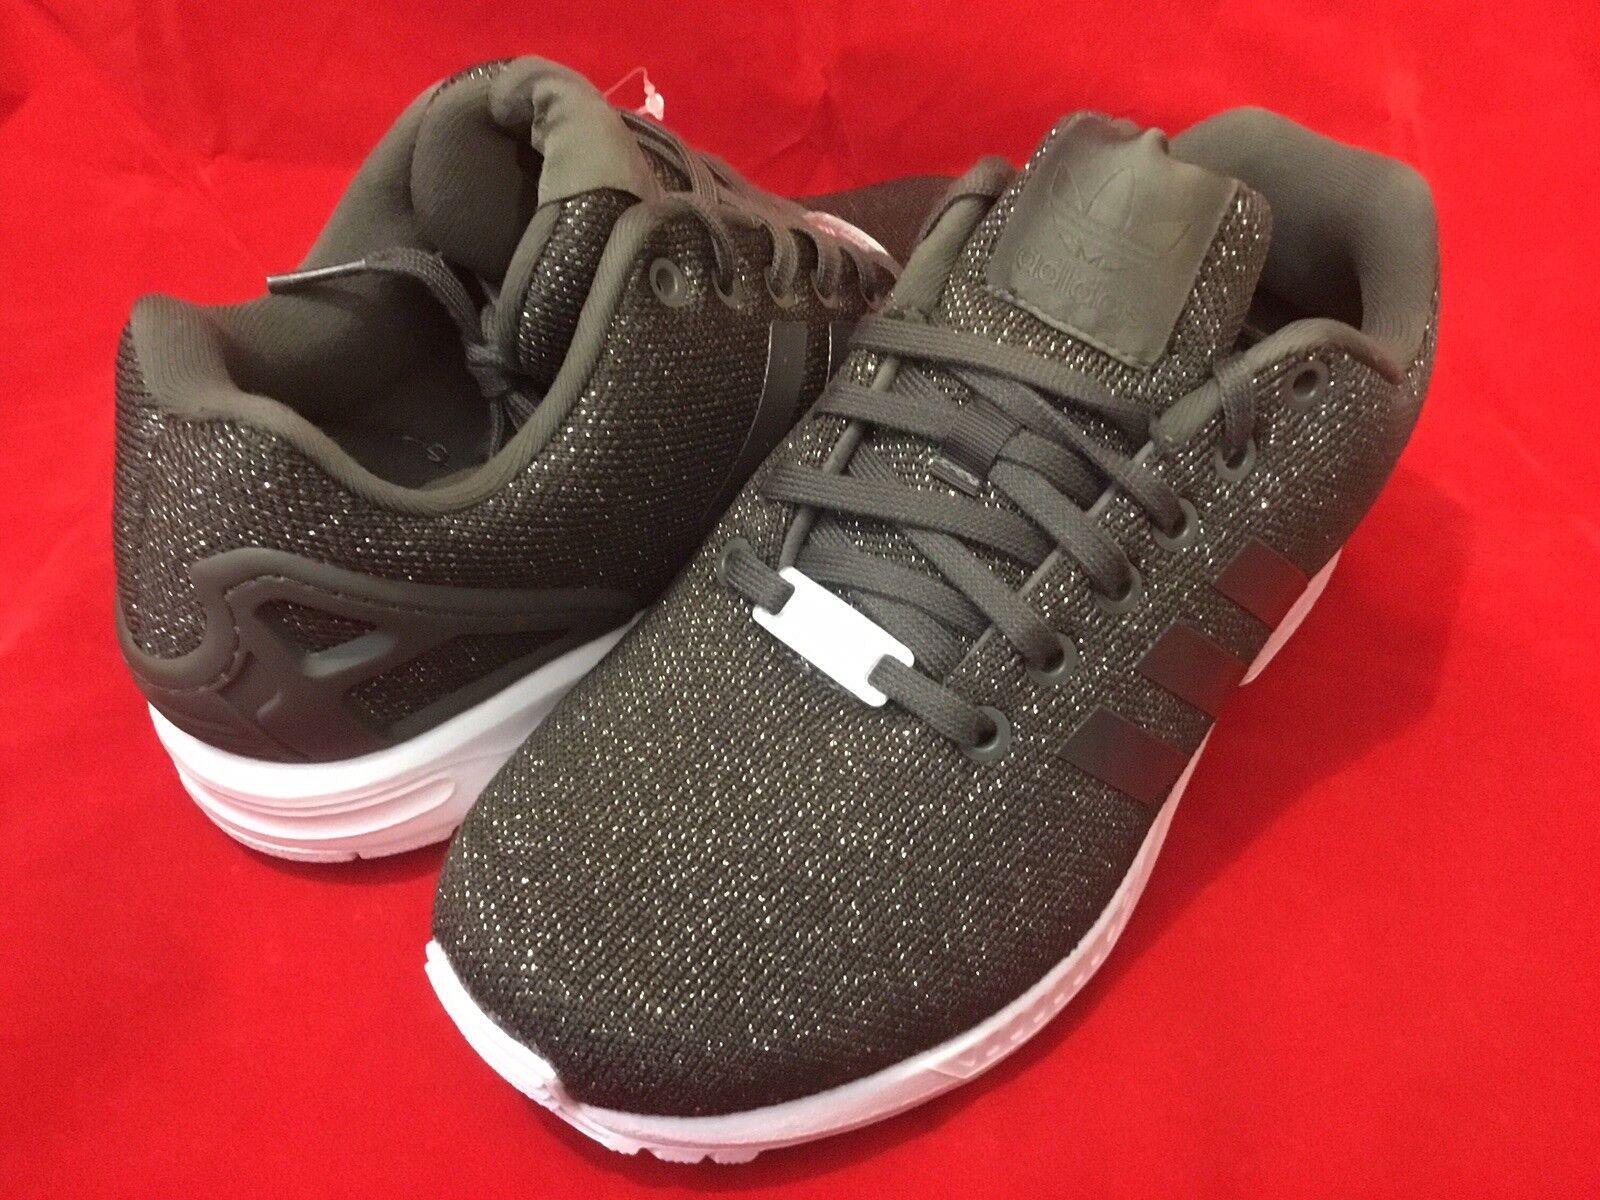 Adidas Originals Women's ZX Flux Torsion Running shoes BY9210 Size 7.5